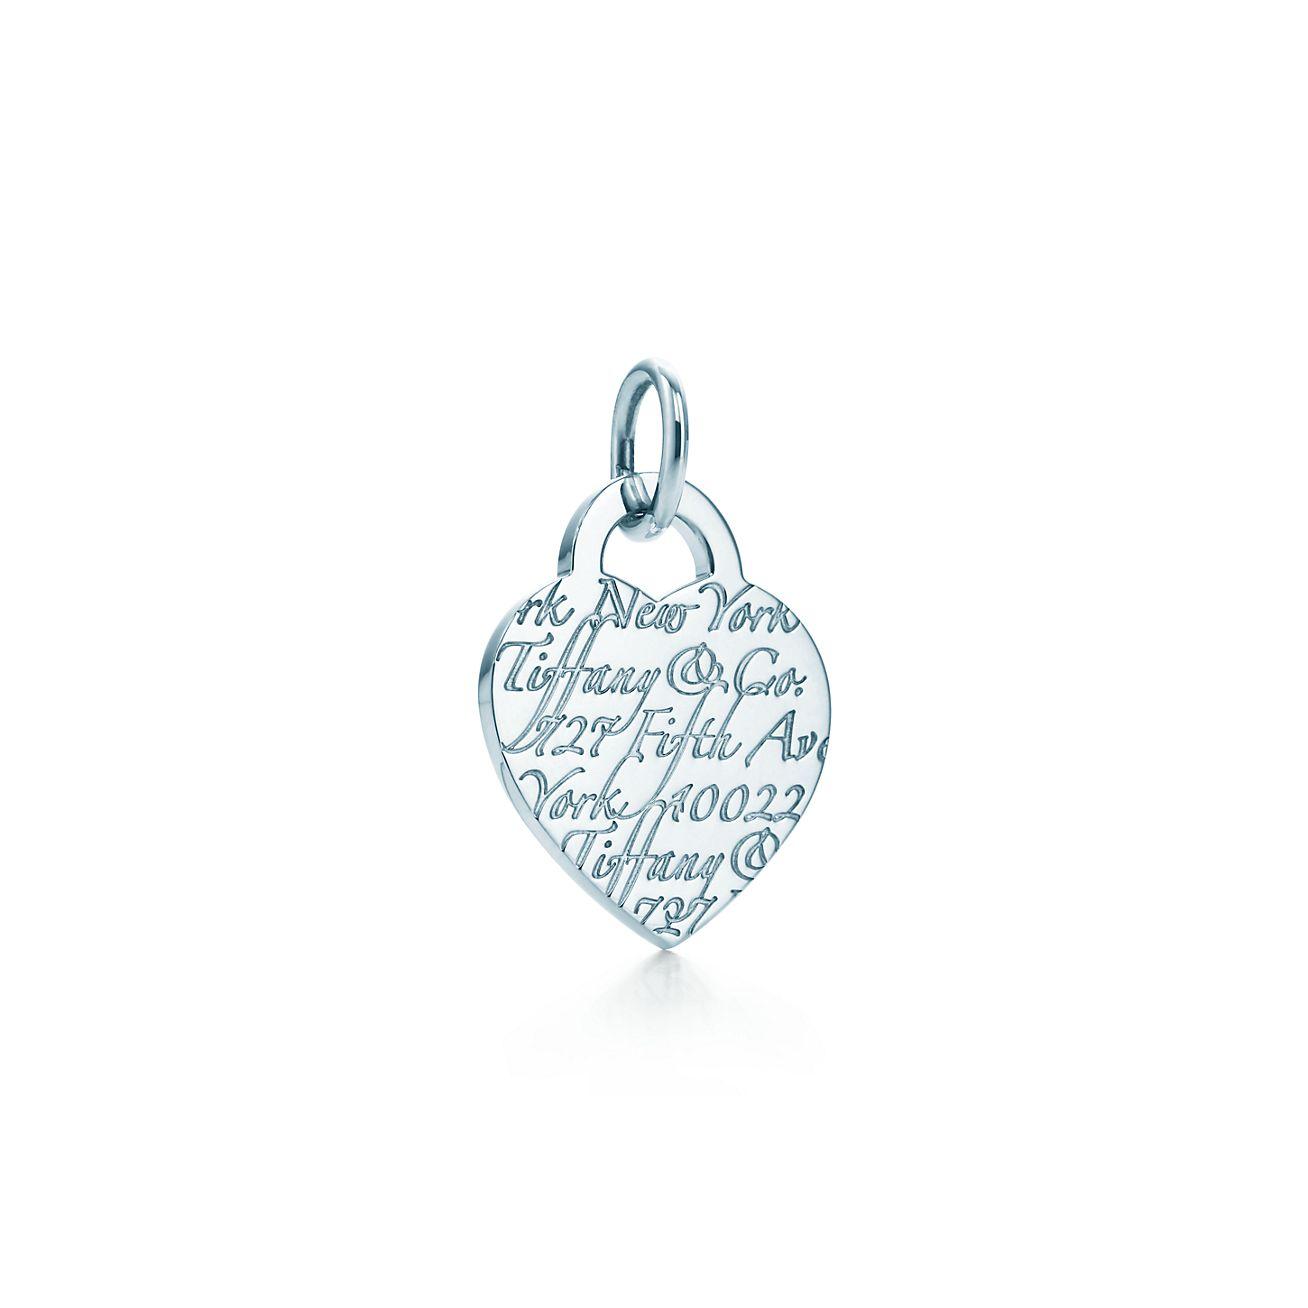 Tiffany Blue Wedding Invitations was beautiful invitation sample